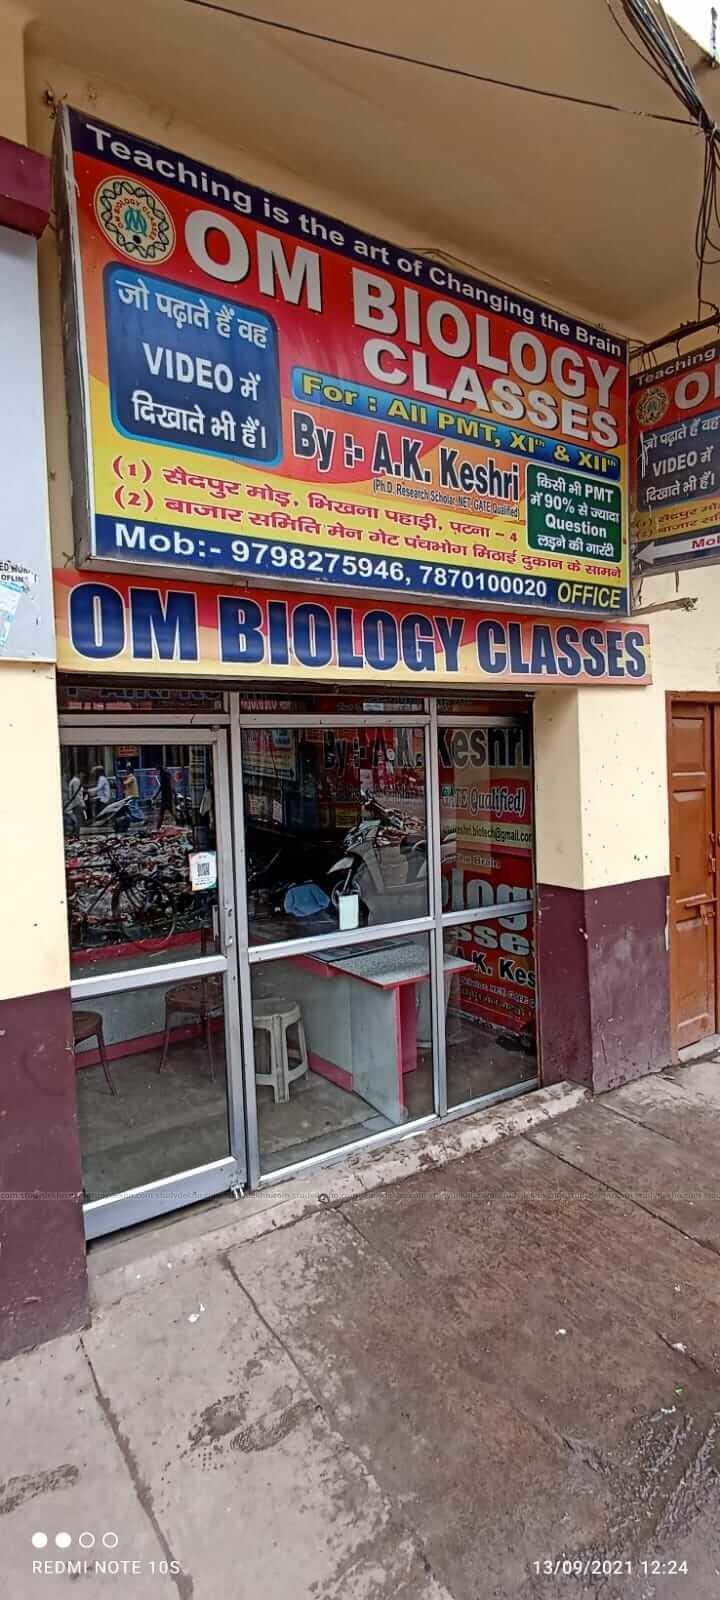 Om Biology Classes Logo